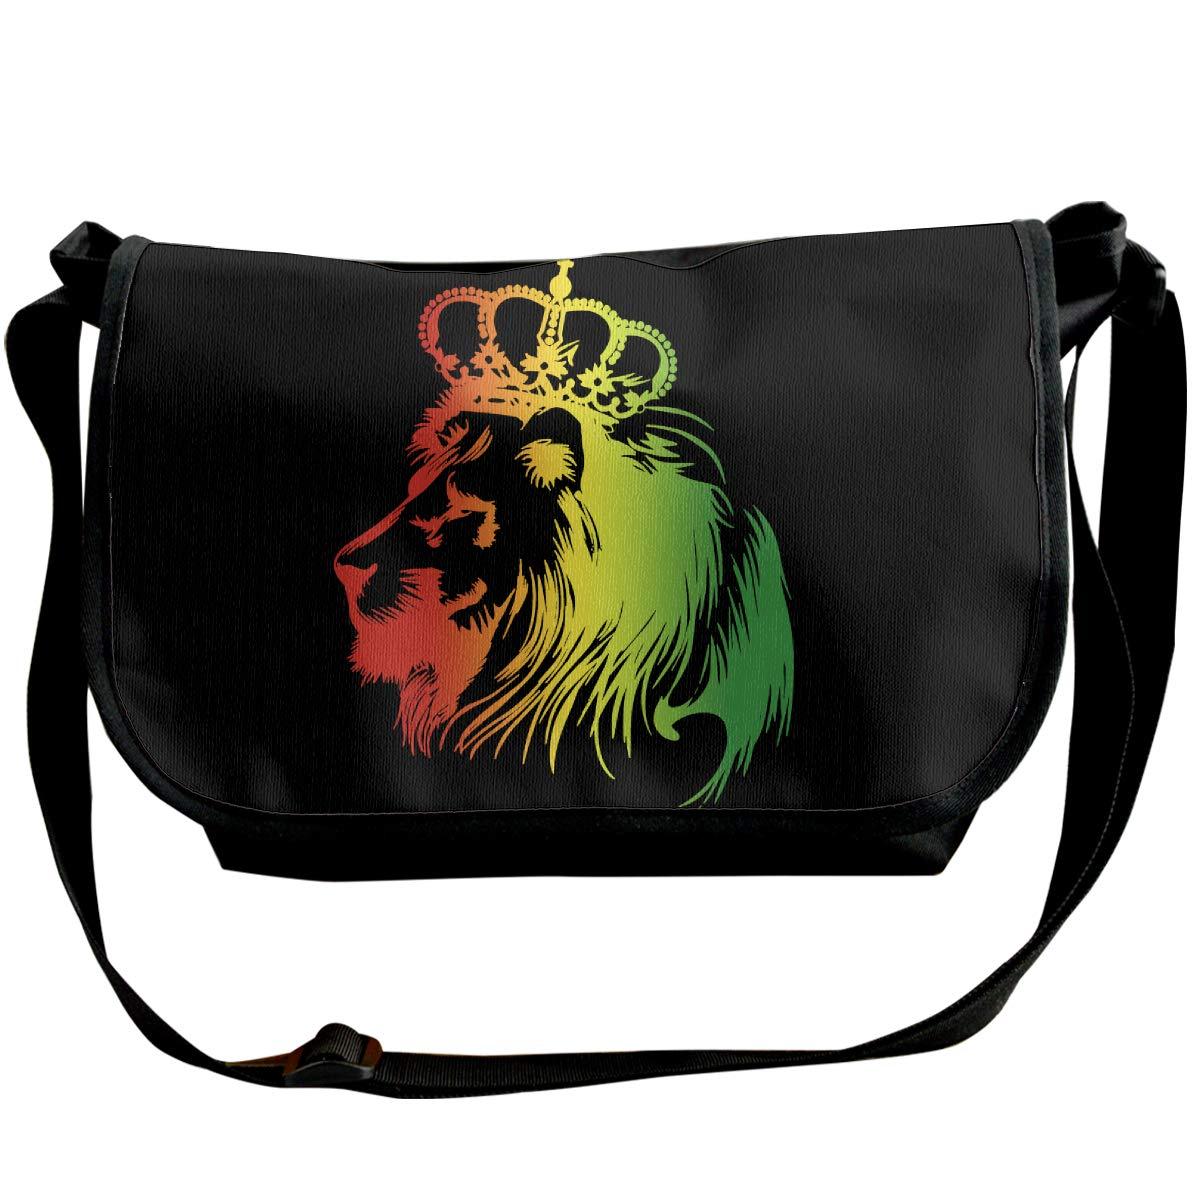 Futong Huaxia Rasta Lion Travel Messenger Bags Handbag Shoulder Bag Crossbody Bag Unisex